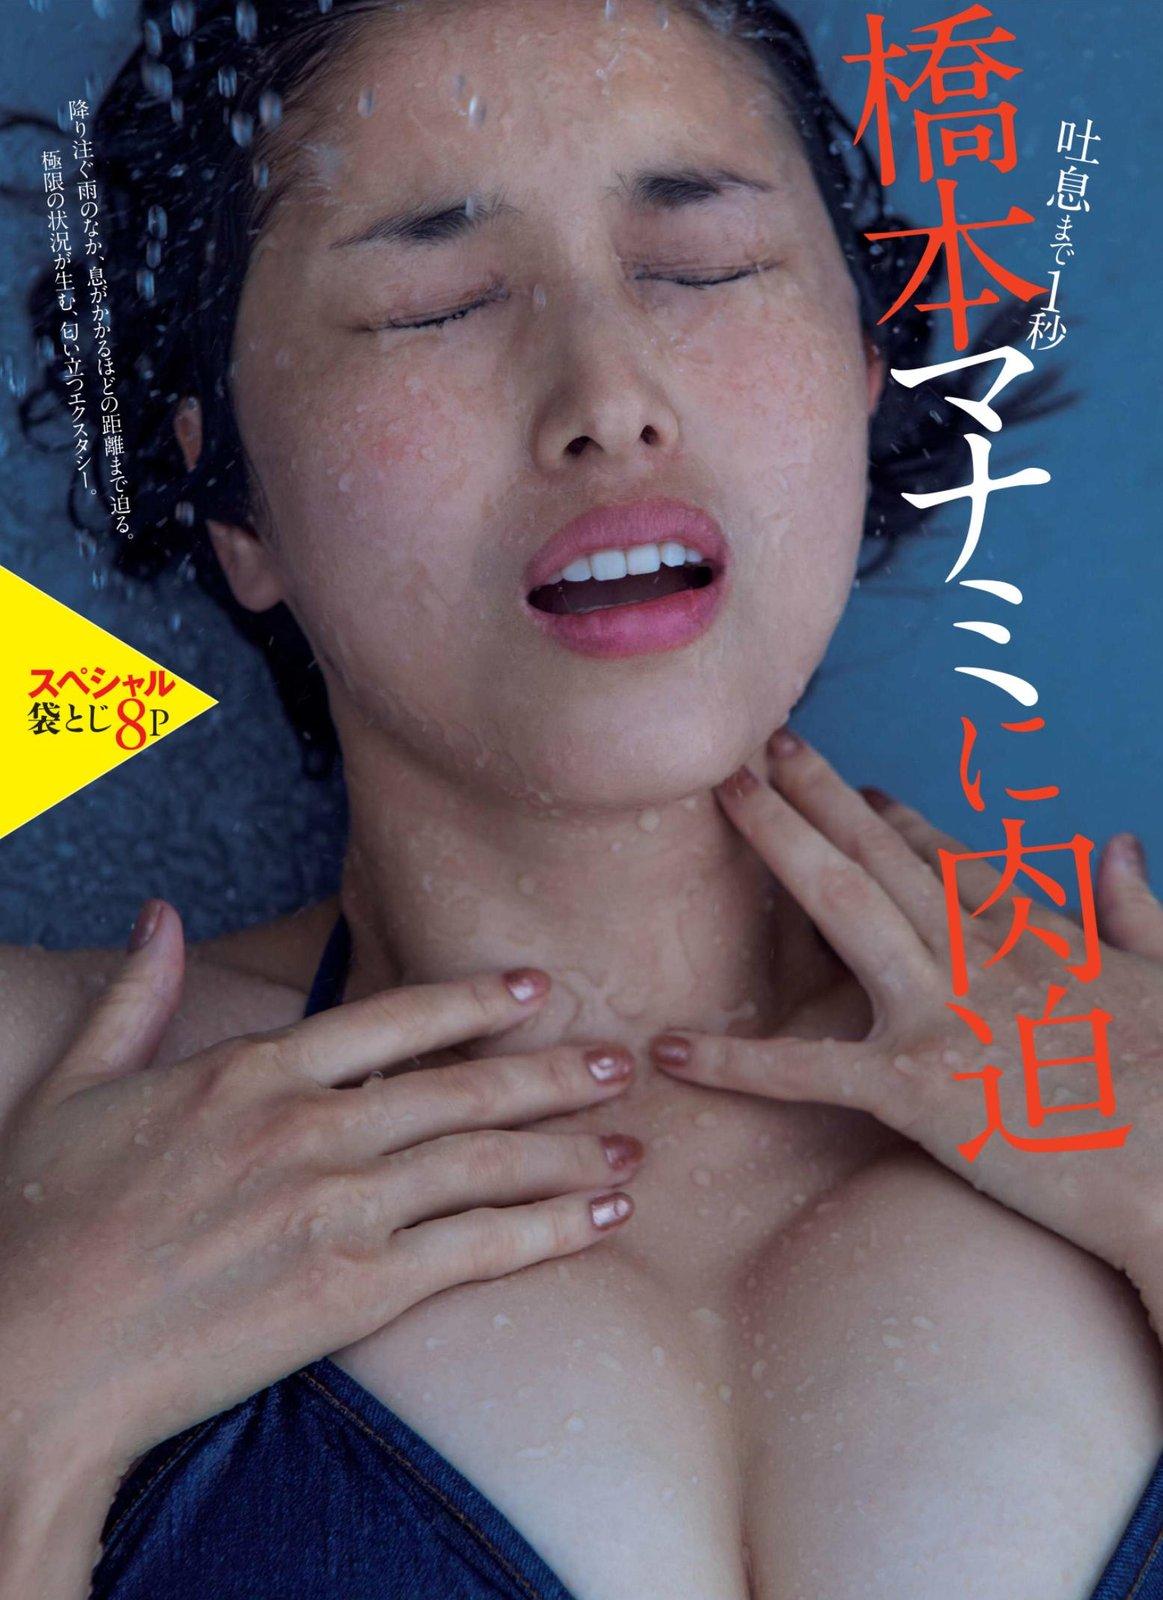 Manami Hashimoto 橋本マナミ, FRIDAY 2017.09.15 (フライデー 2017年09月15日号)